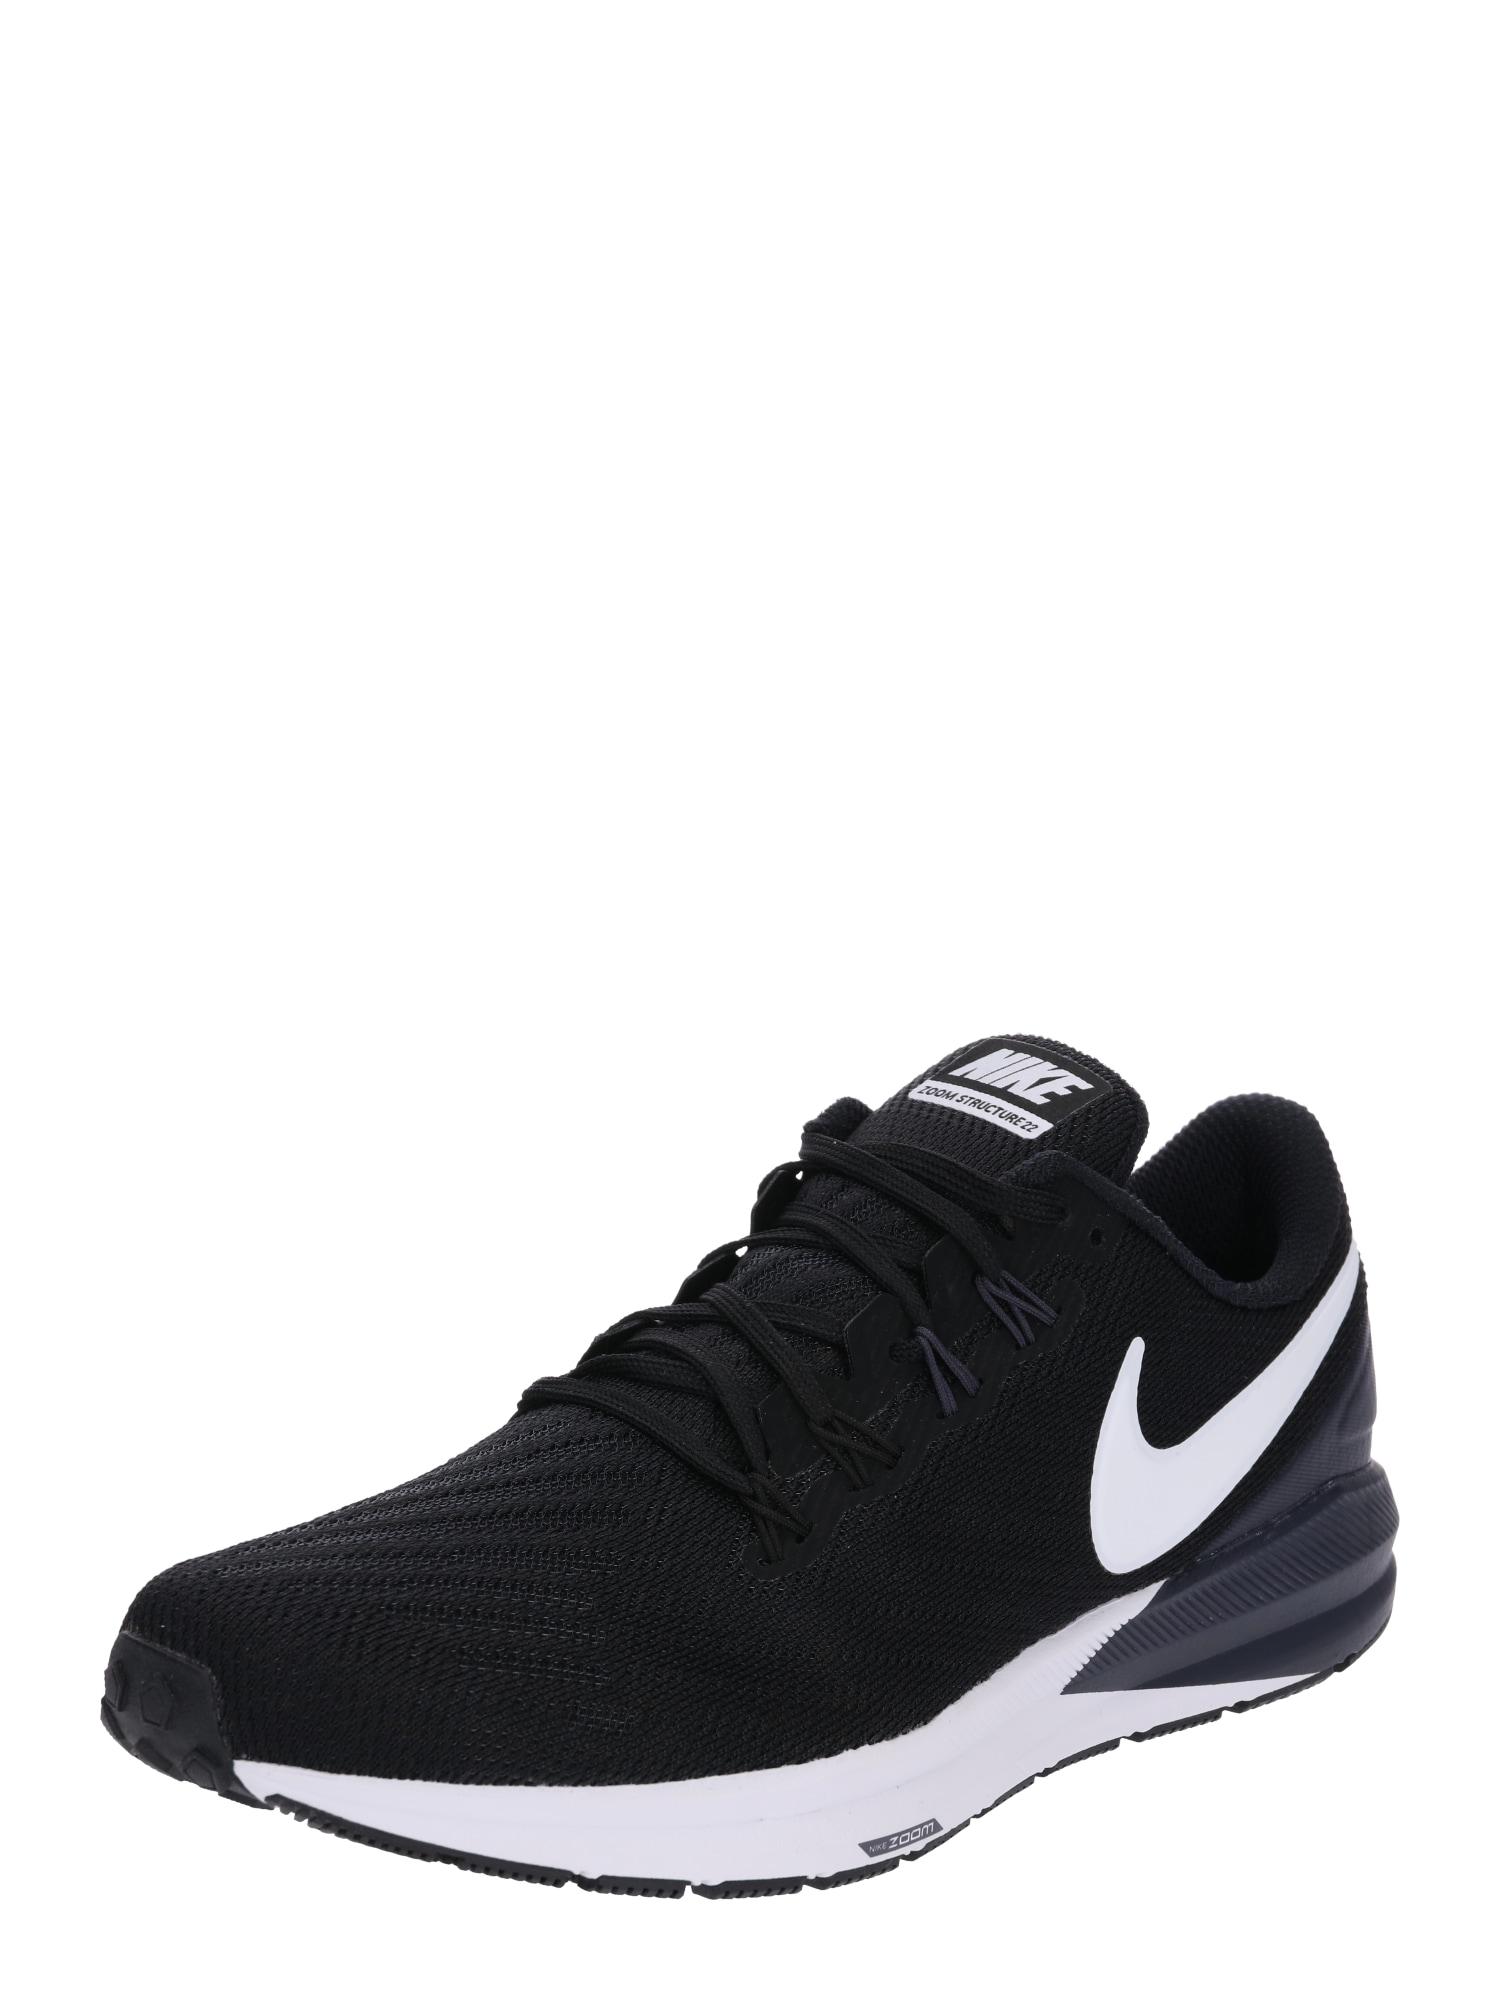 Běžecká obuv Air Zoom Structure 22 černá bílá NIKE